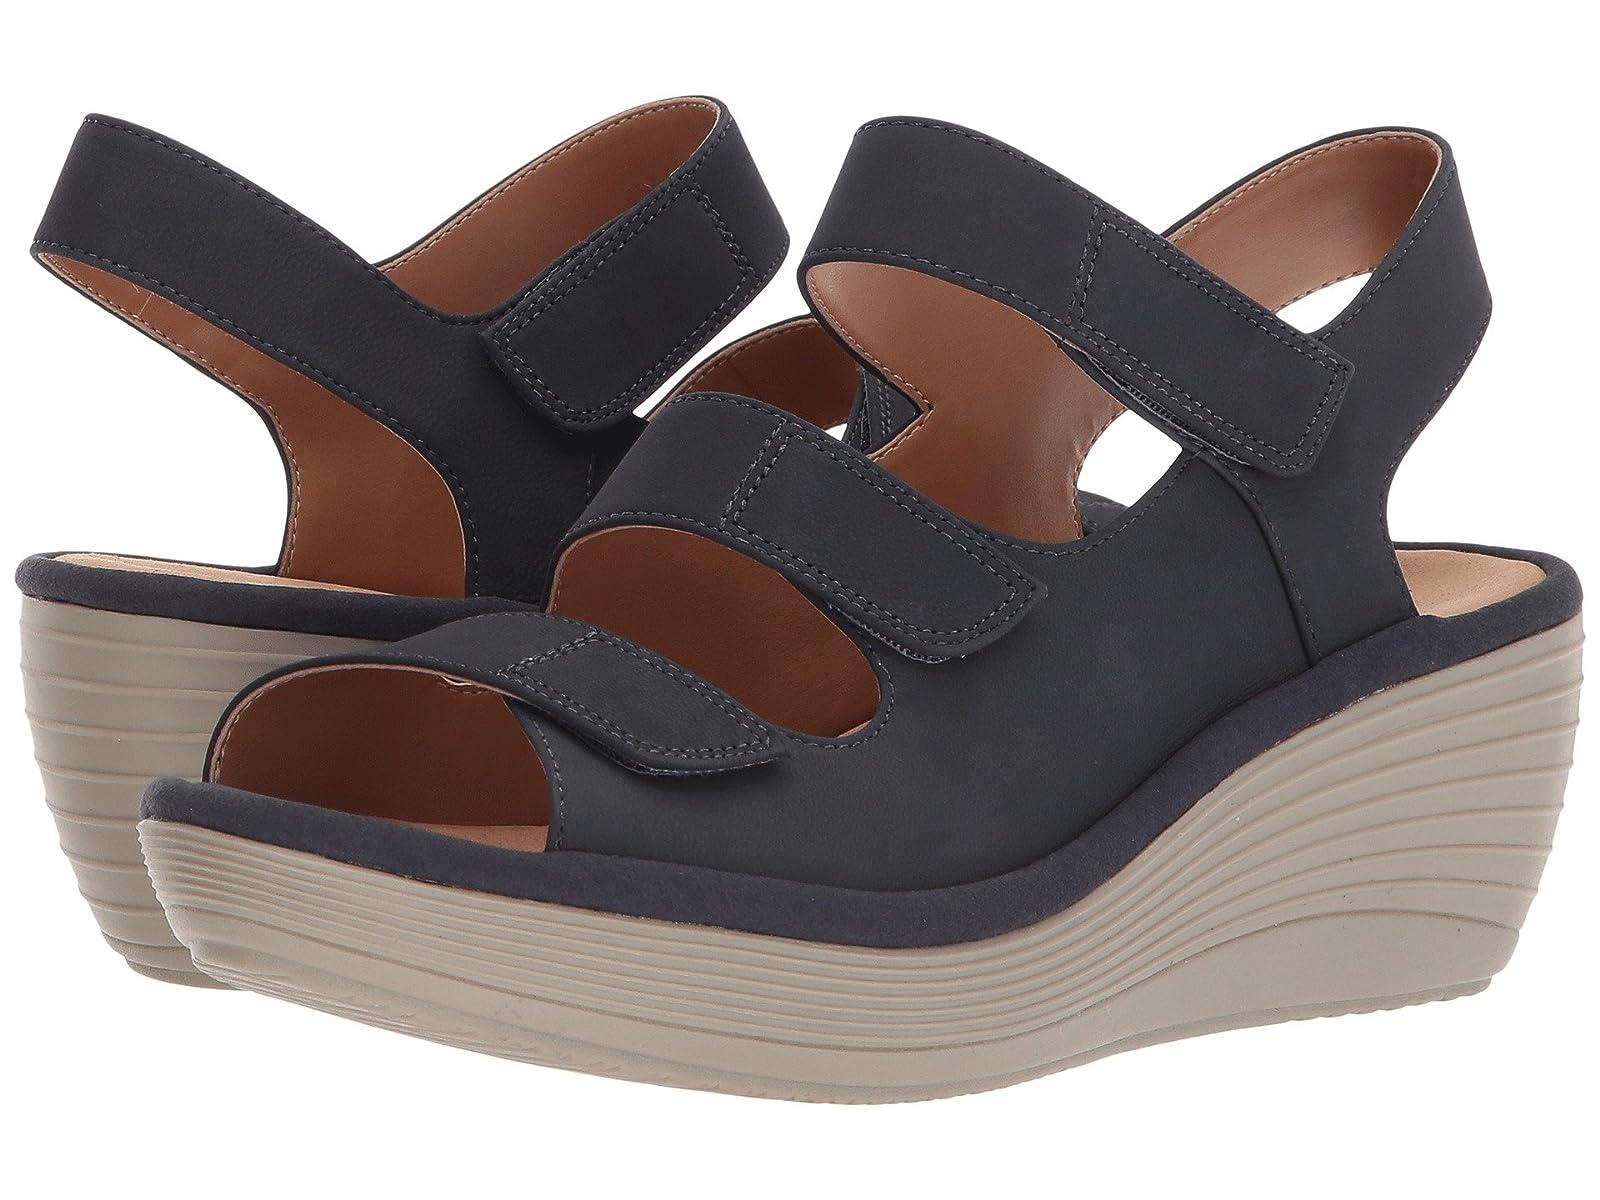 Clarks Reedly JunoAtmospheric grades have affordable shoes